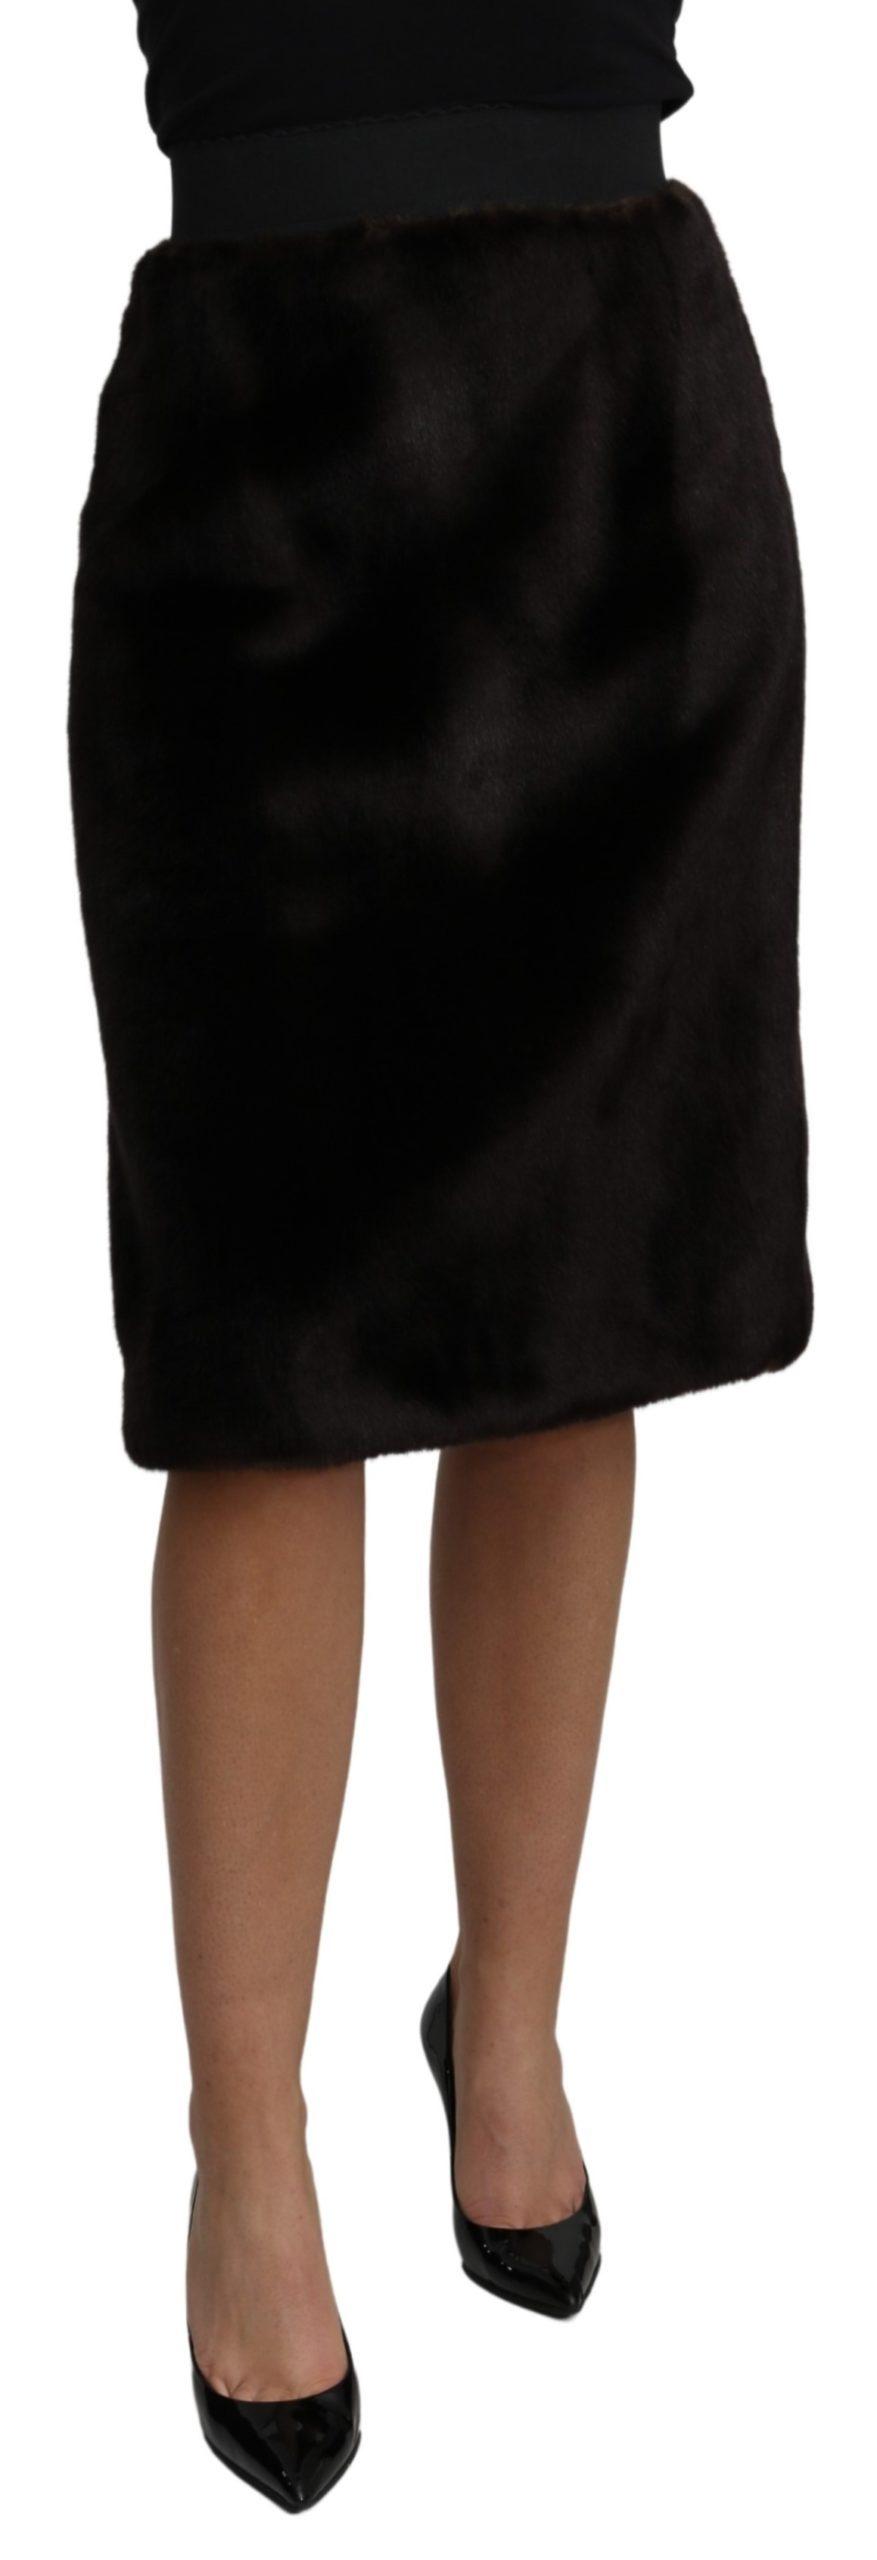 Dolce & Gabbana Women's High Waist Pencil Cut Knee Length Skirt Black SKI1473 - IT40 S